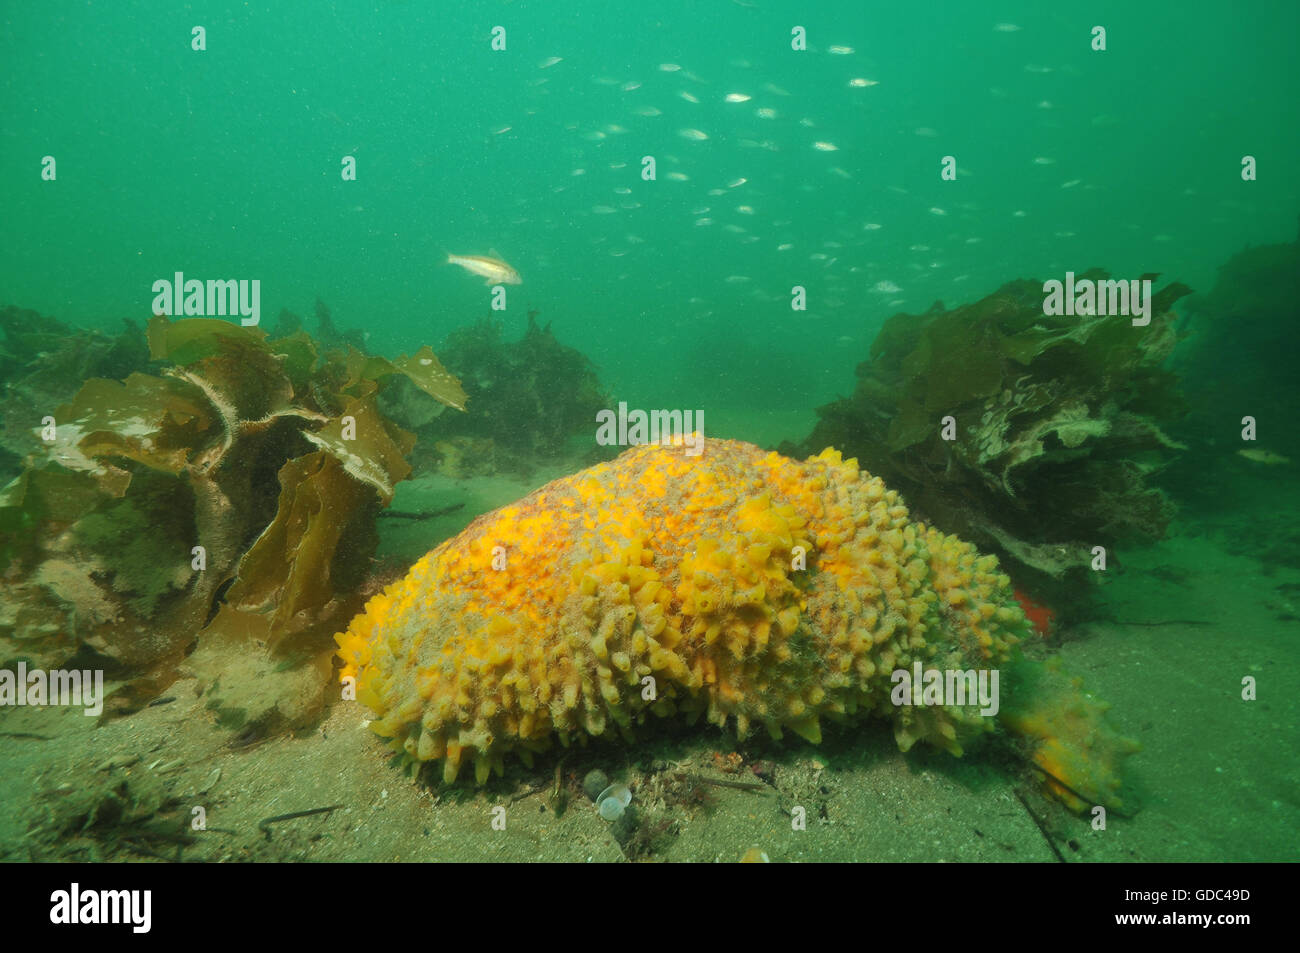 Large yellow sponge on flat bottom - Stock Image